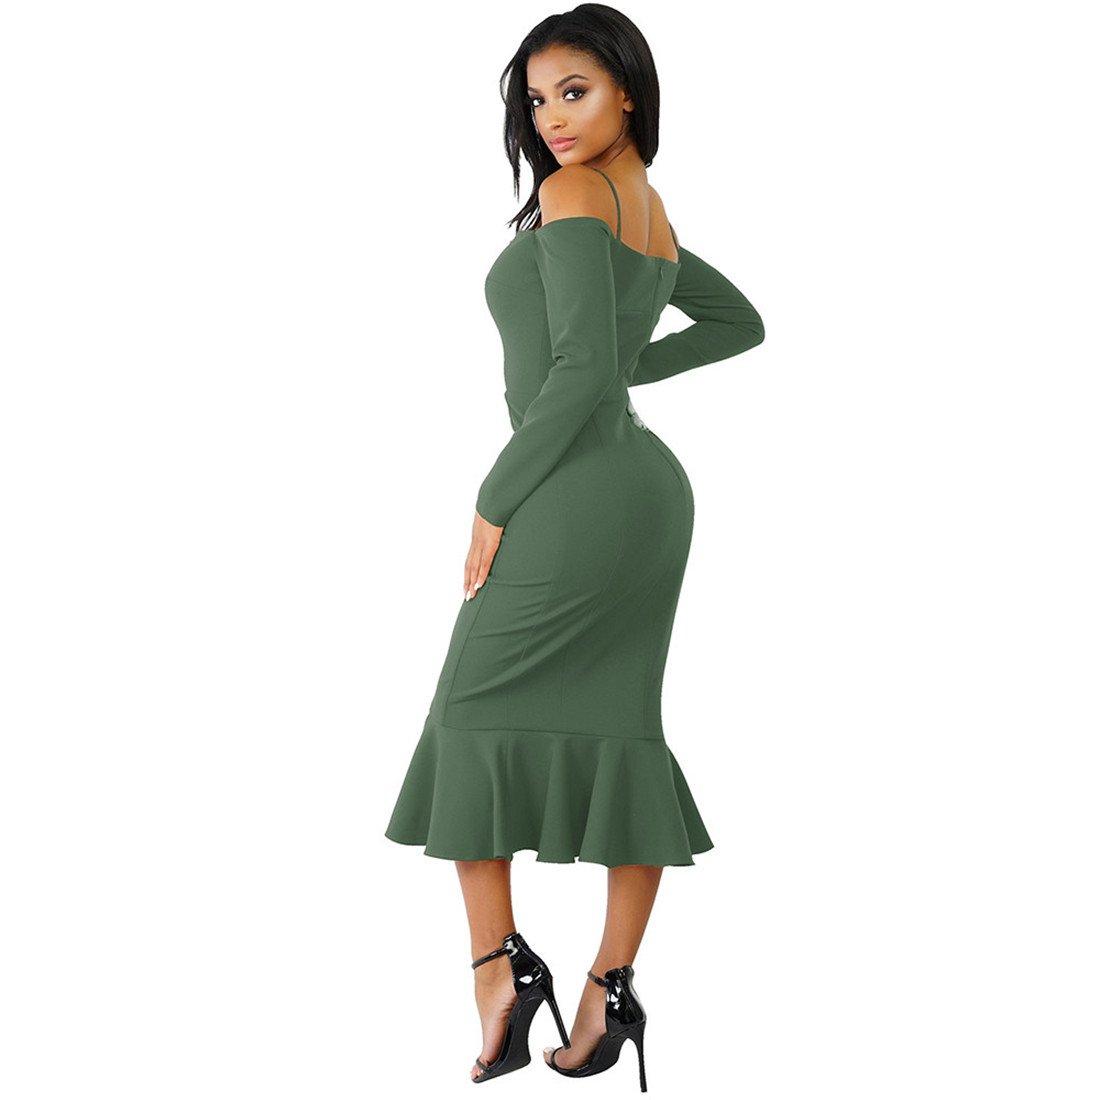 Womens Dresses,Moonuy Girl Slash Neck Ruffle Long Sleeve Evening Party Beach Dress For Ladies Fashion Spring Autumn Summer Casual Elegant Bodycon Skirt ...